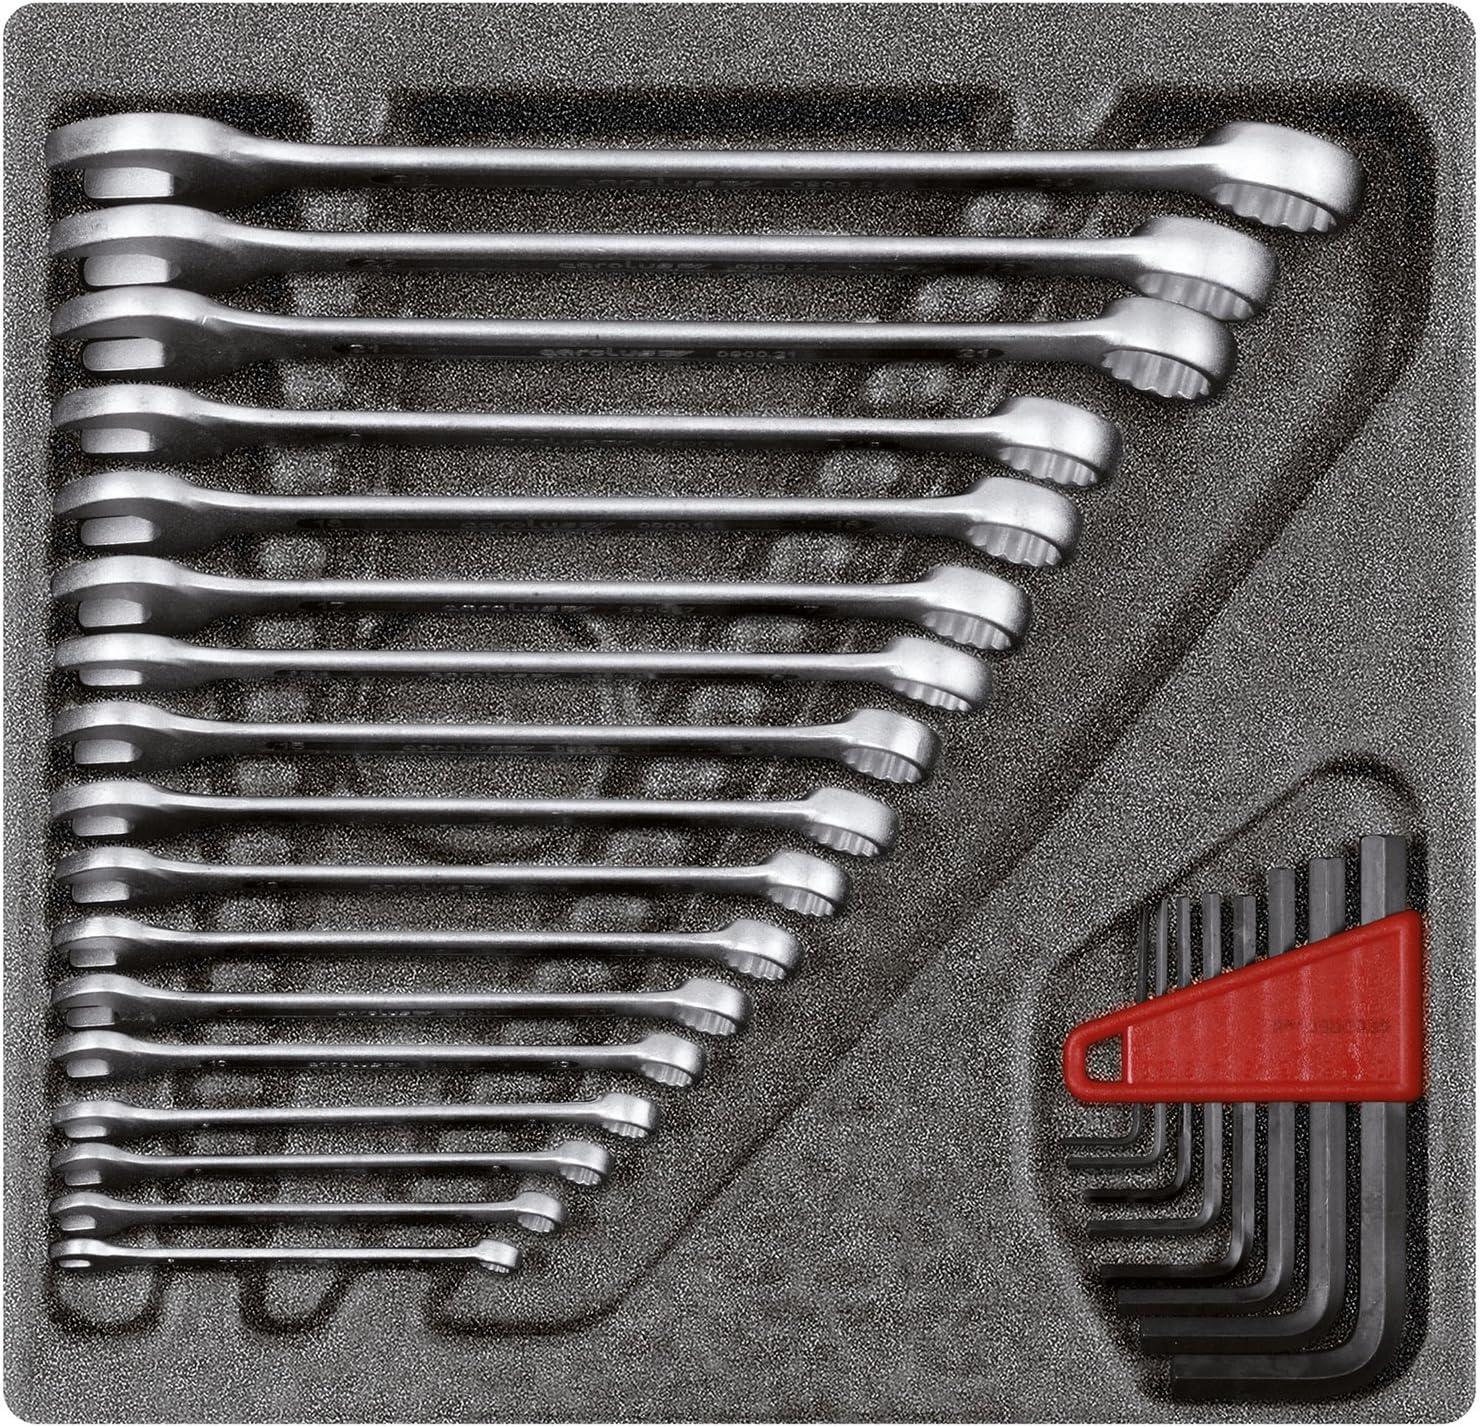 GEDORE RED Ring spanner set 4//6 CT-module 26pcs